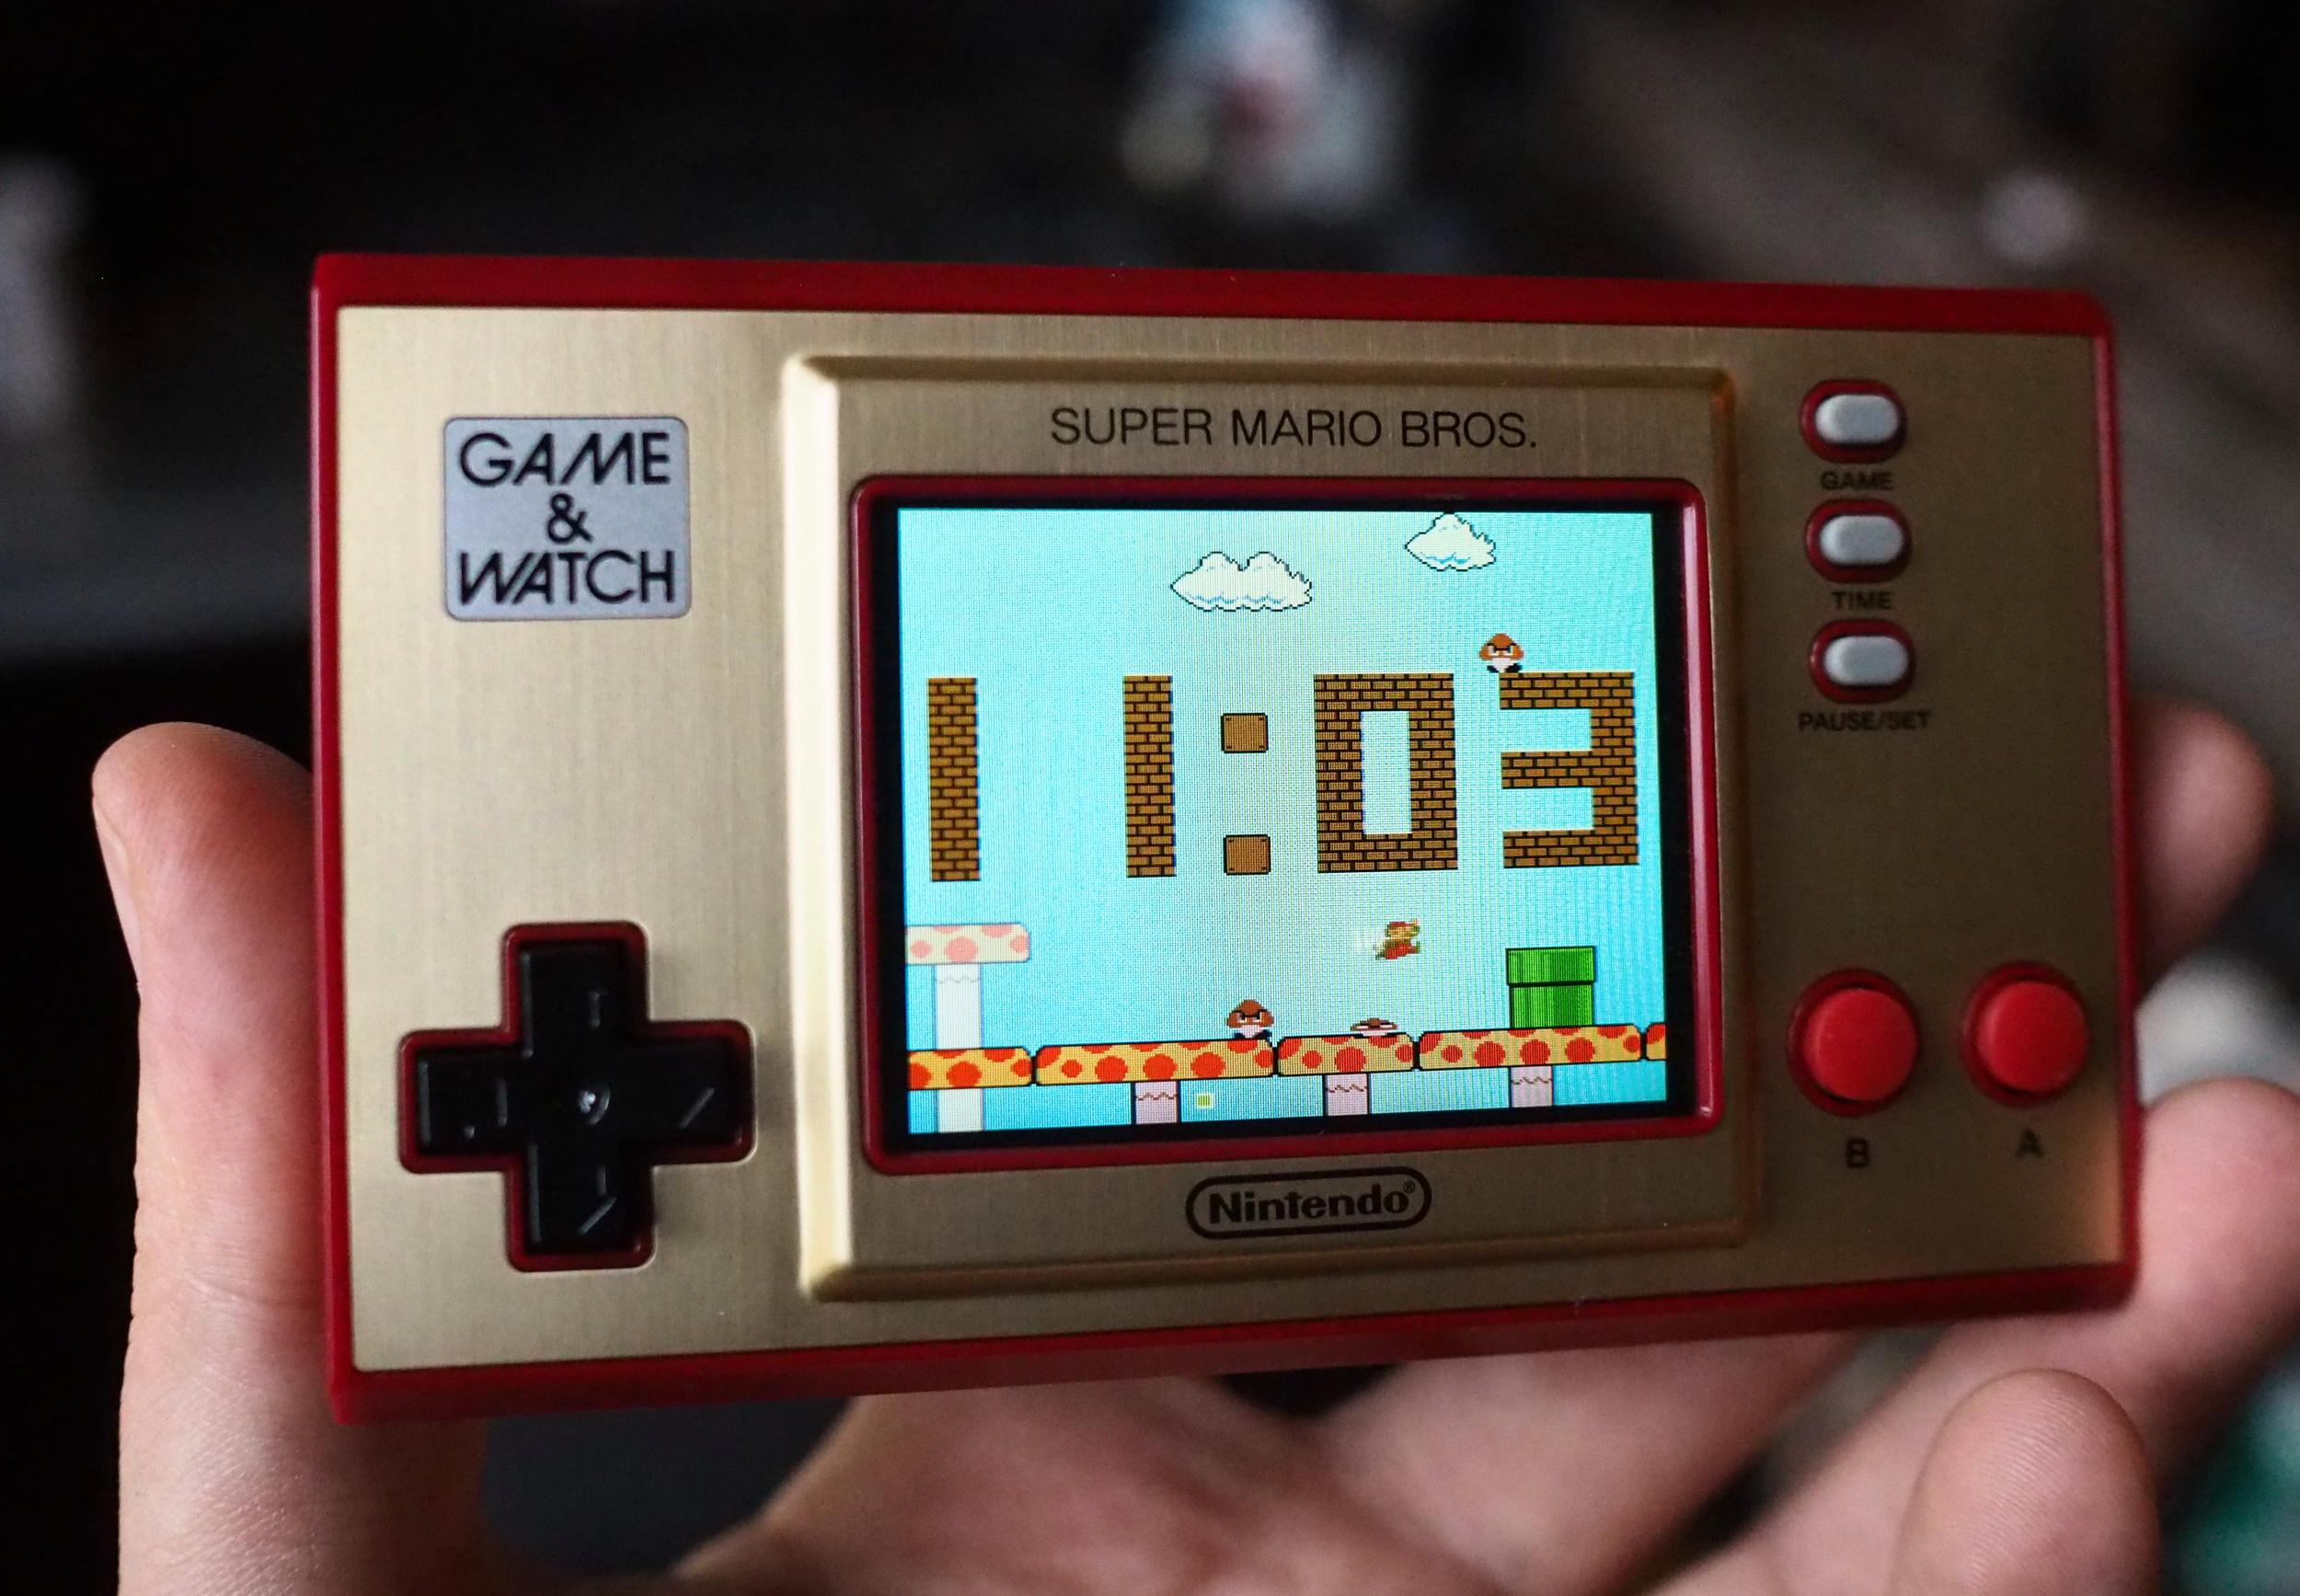 Nintendo's Super Mario Bros handheld system